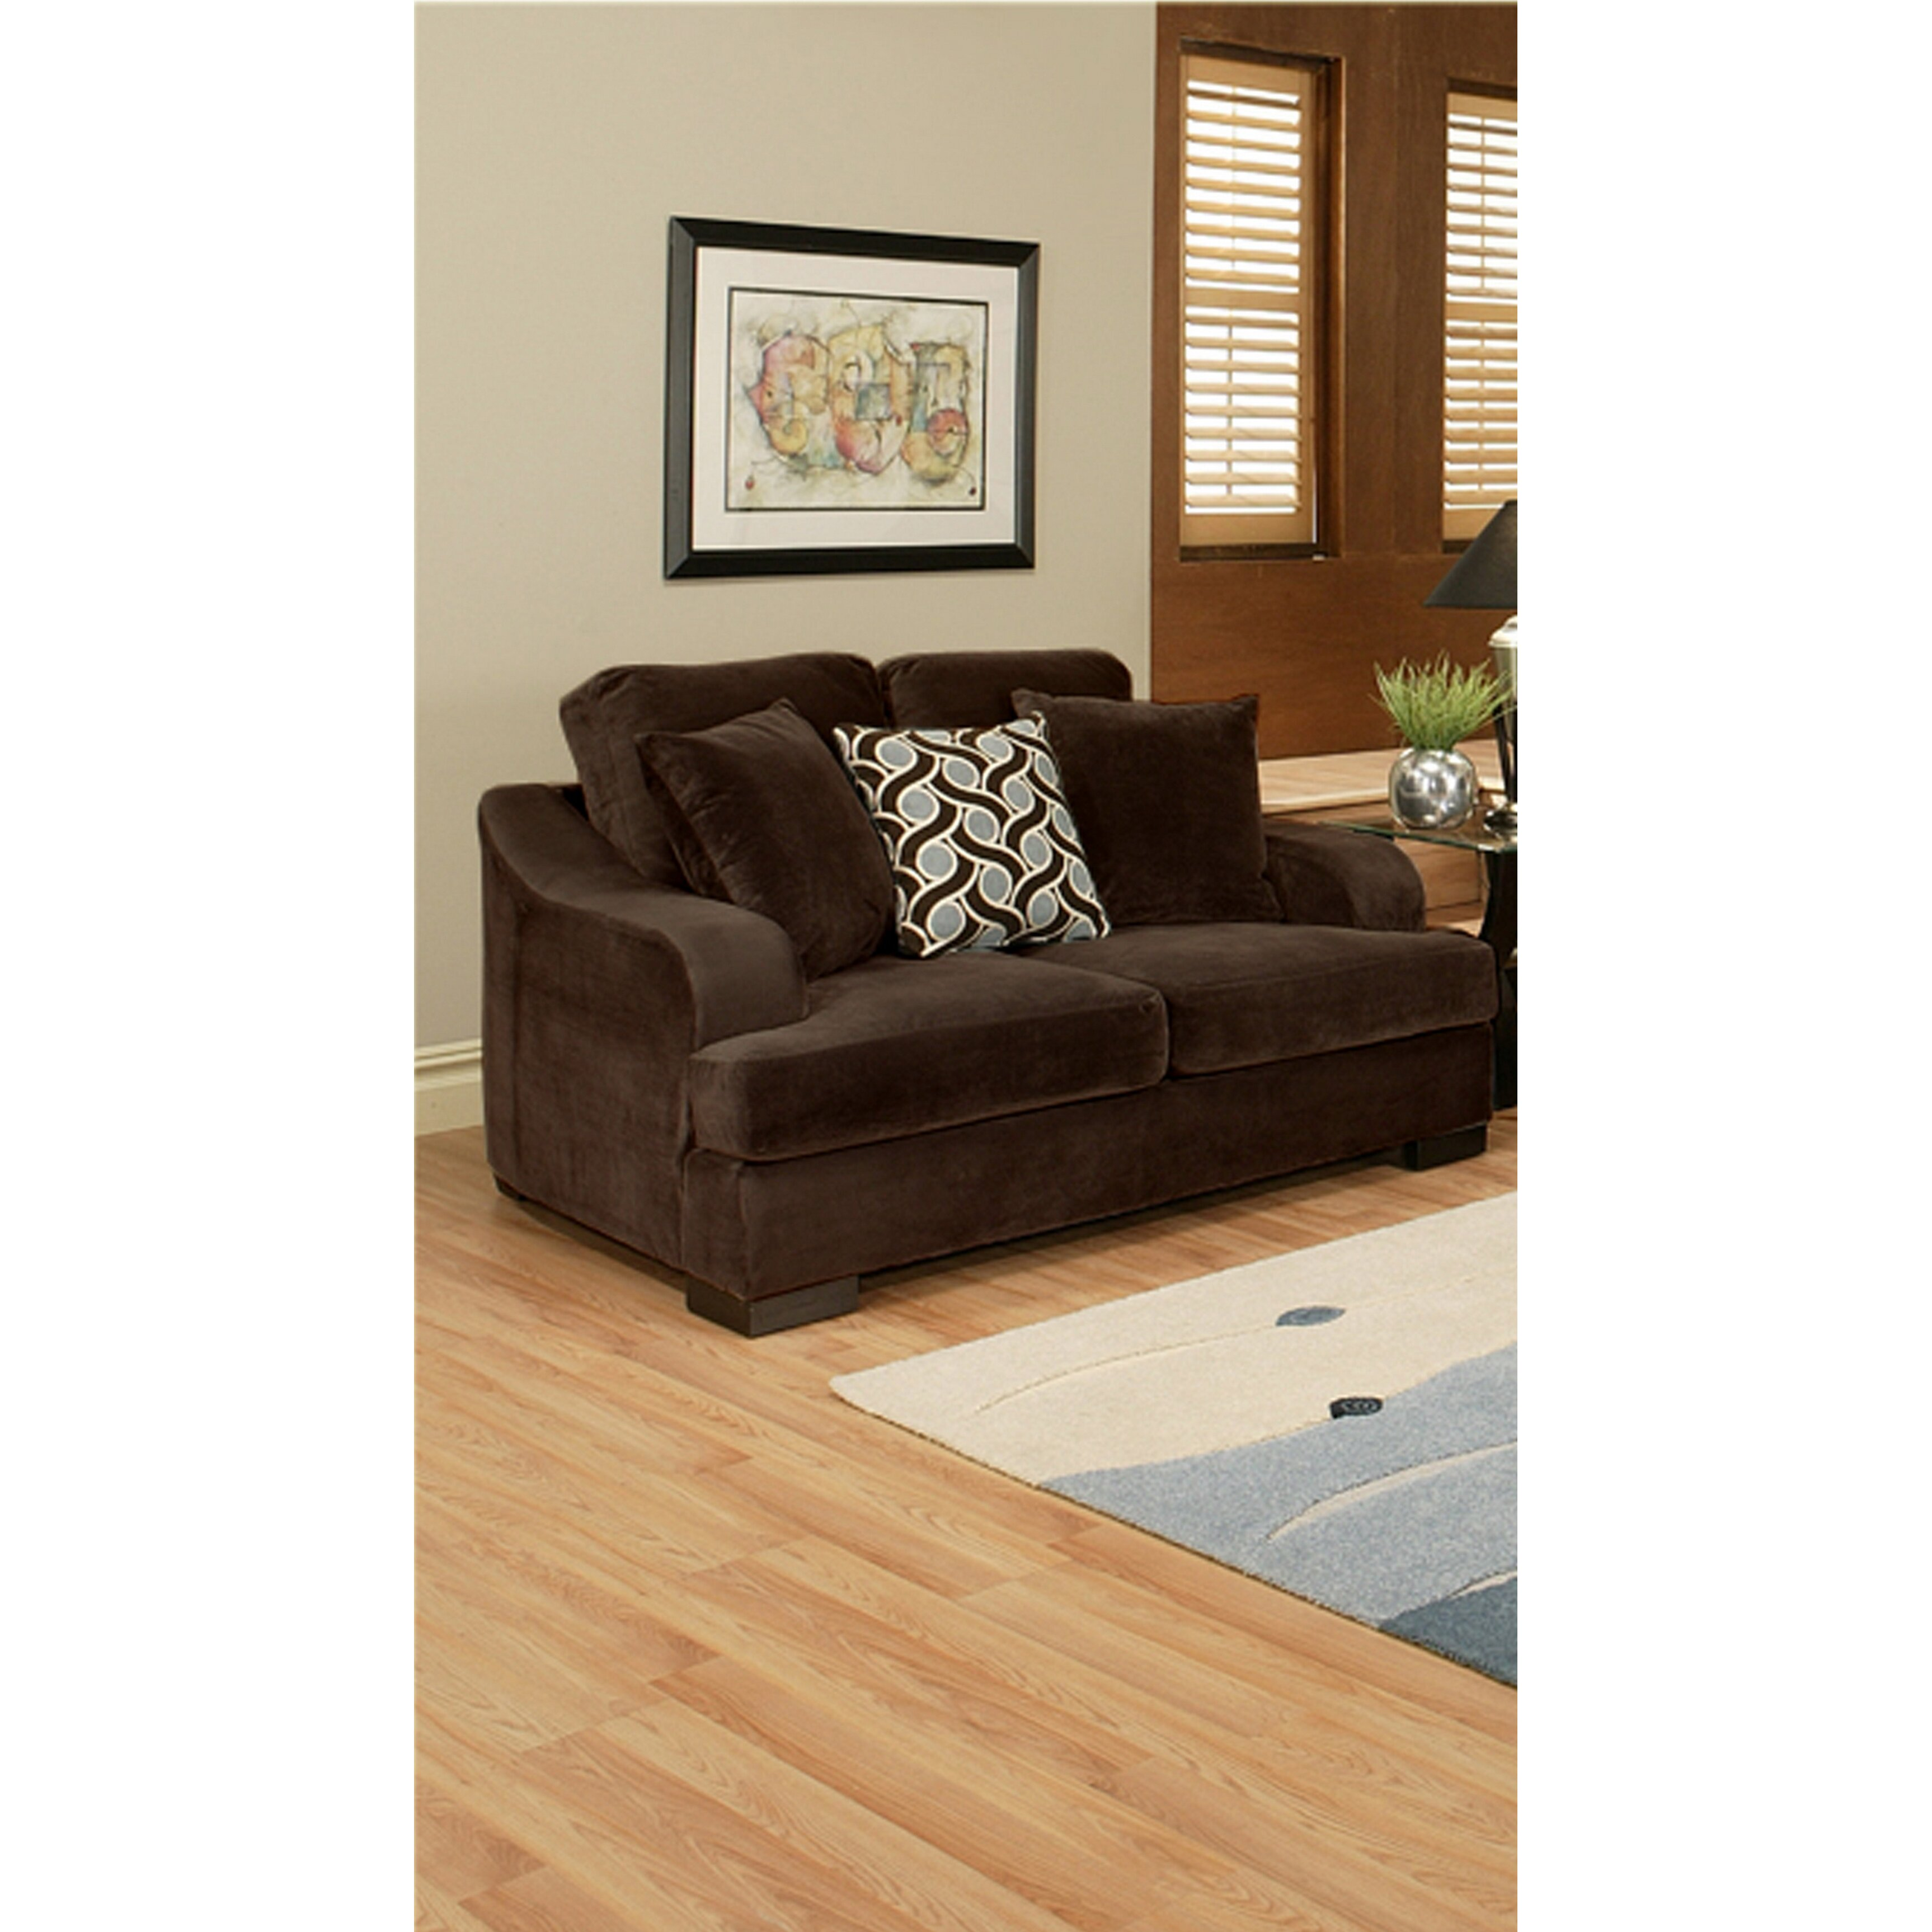 Hokku designs valenciaga living room collection wayfair for Hokku designs living room furniture